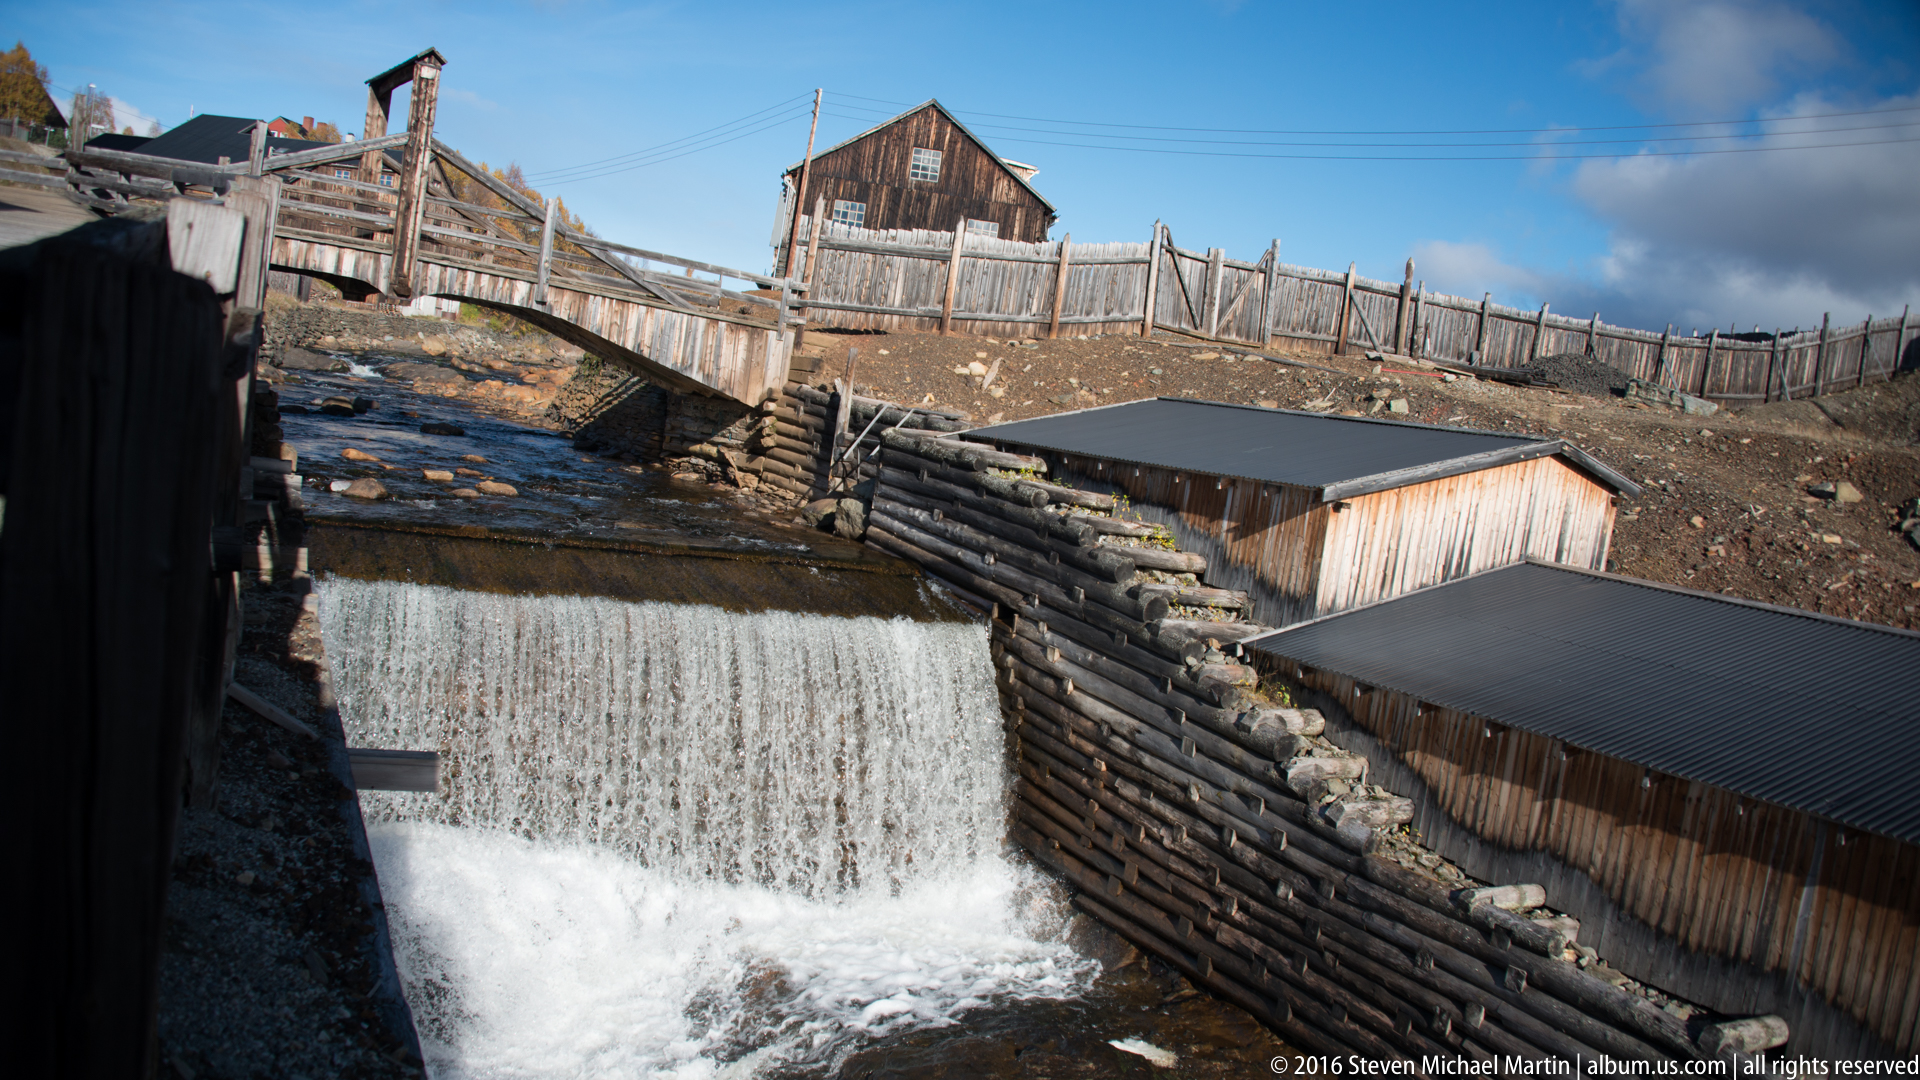 Røa and Glåma Rivers in Roros by Steven Michael Martin